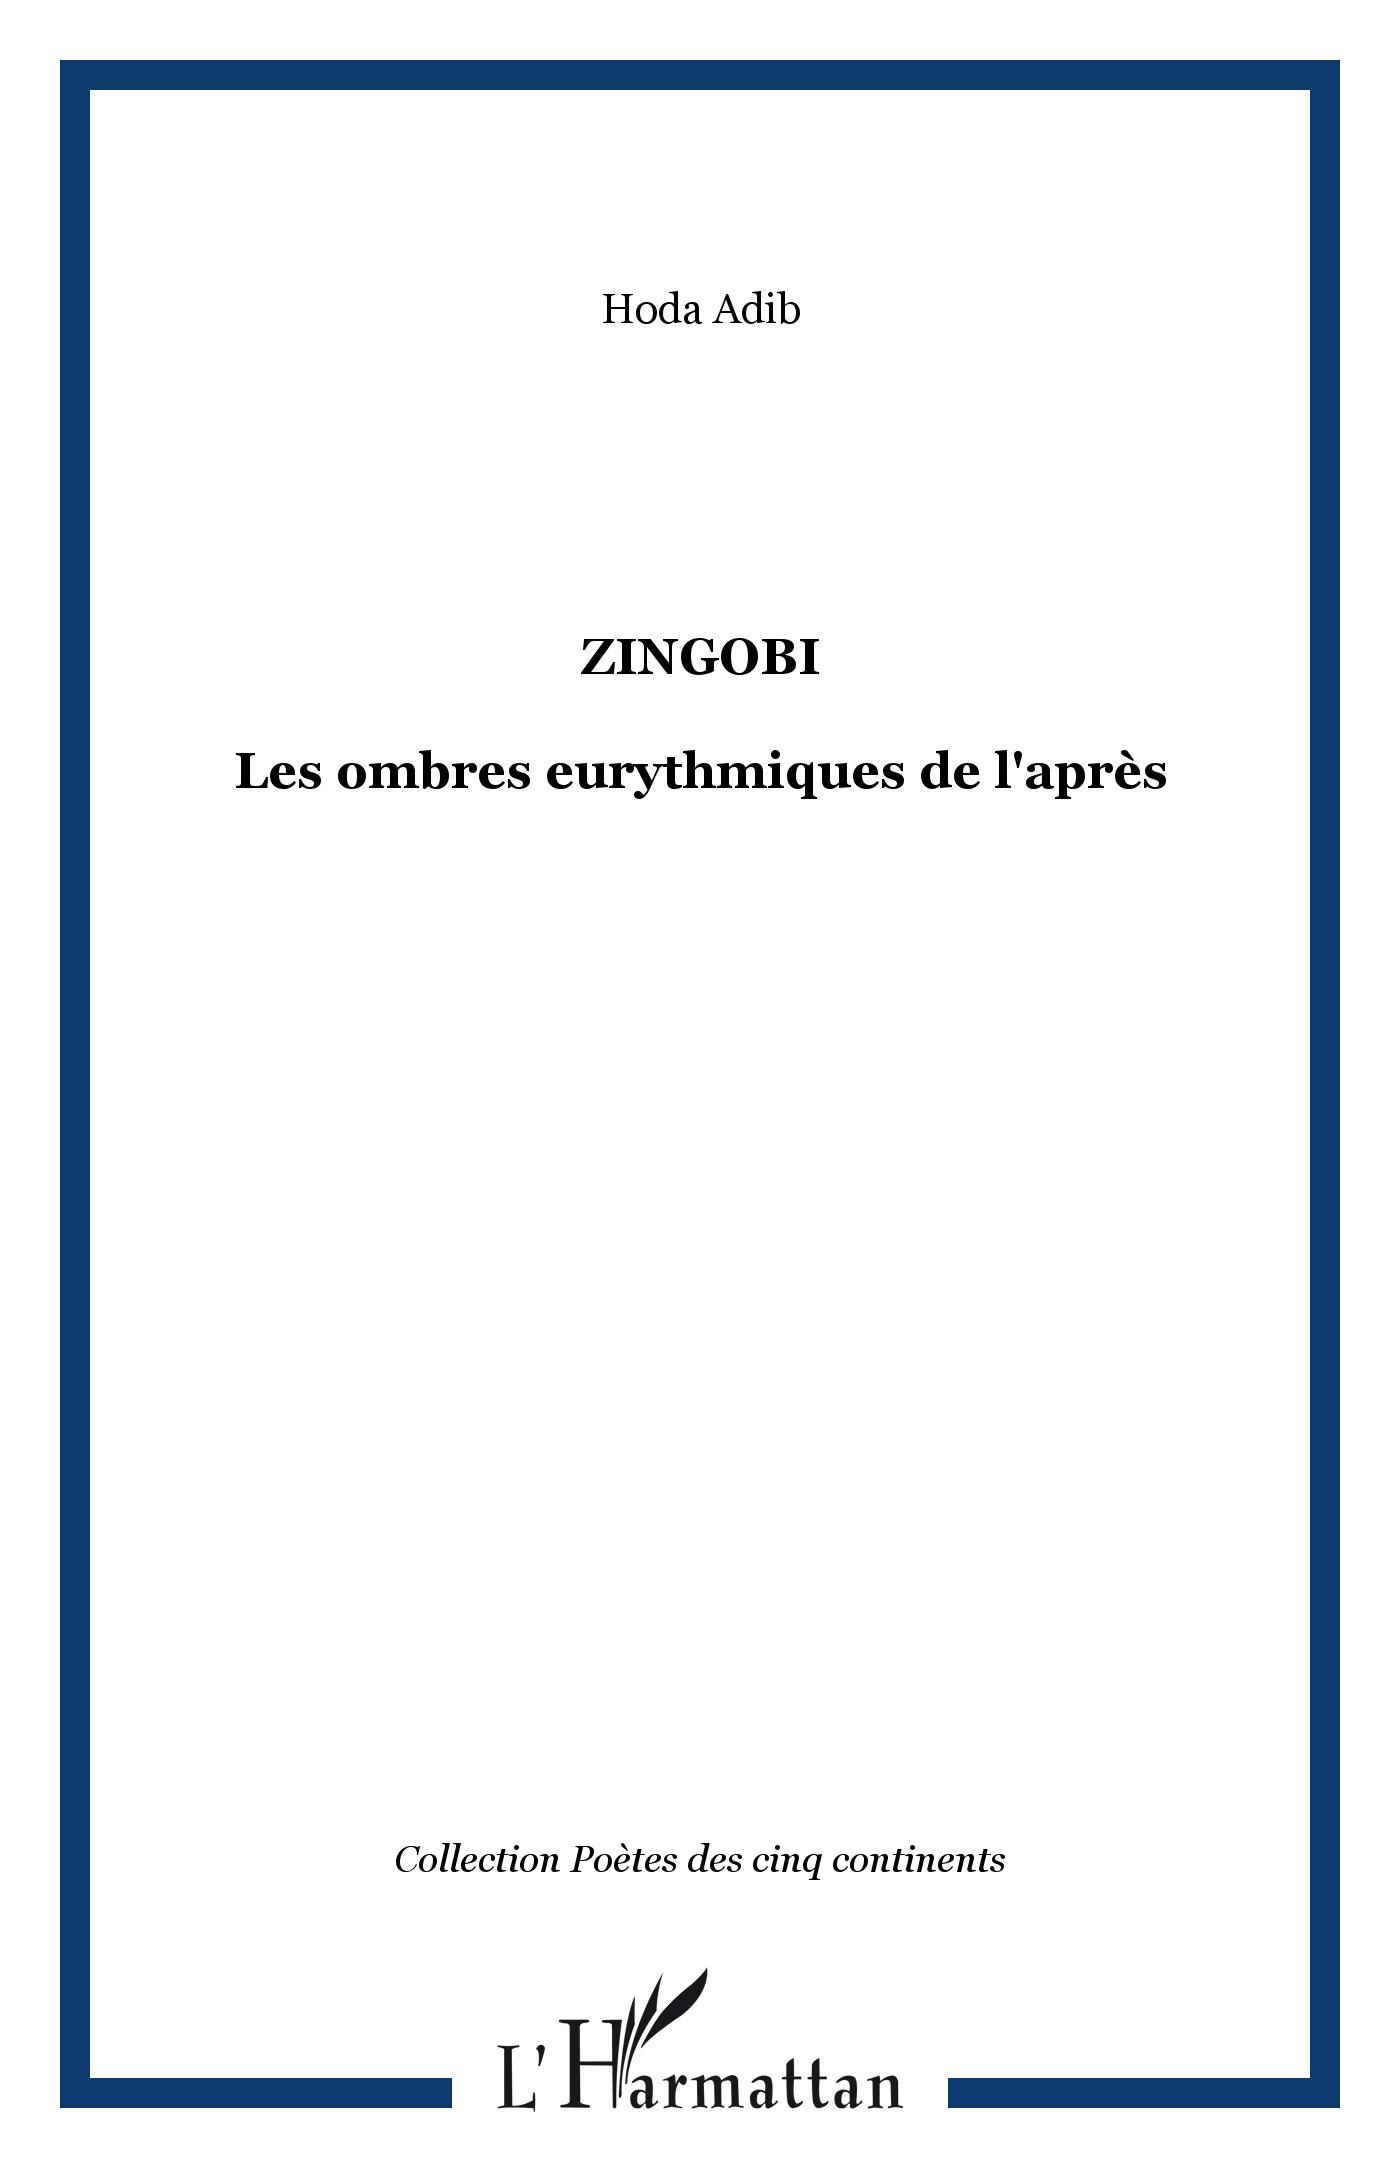 ZINGOBI LES OMBRES EURYTHMIQUES DE L'APRES